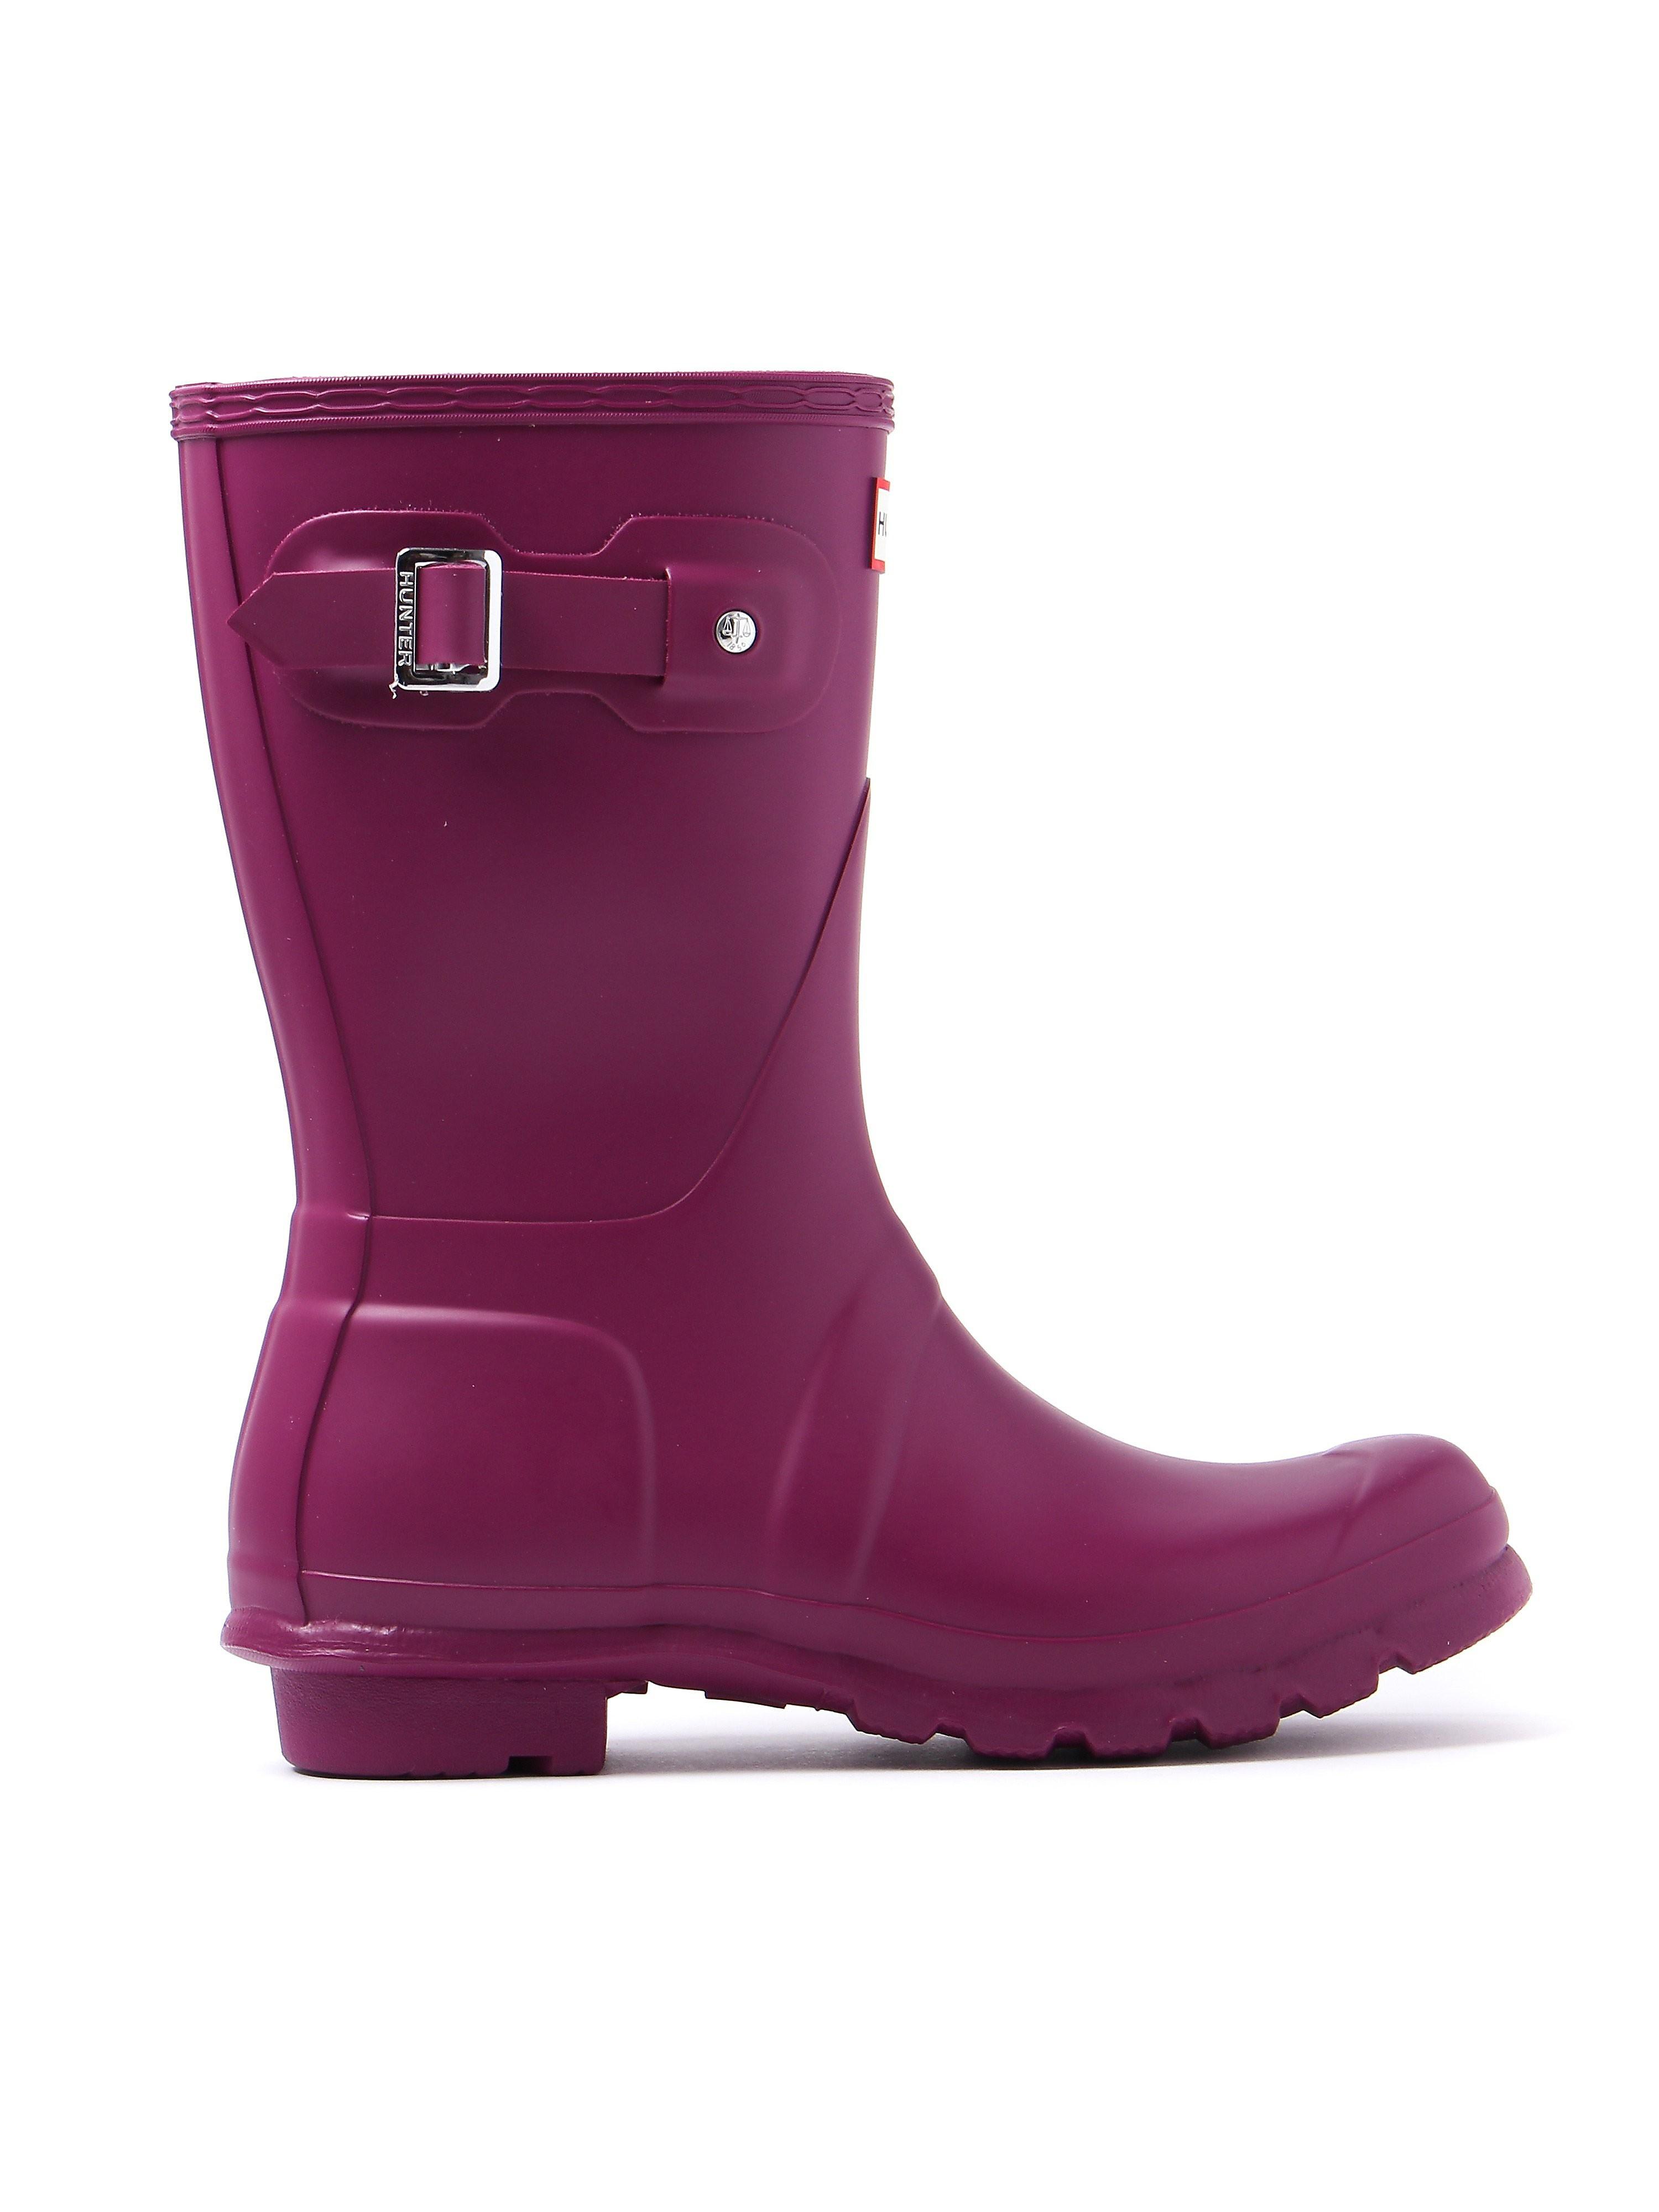 Hunter Wellies Women's Original Short Wellington Boots - Violet